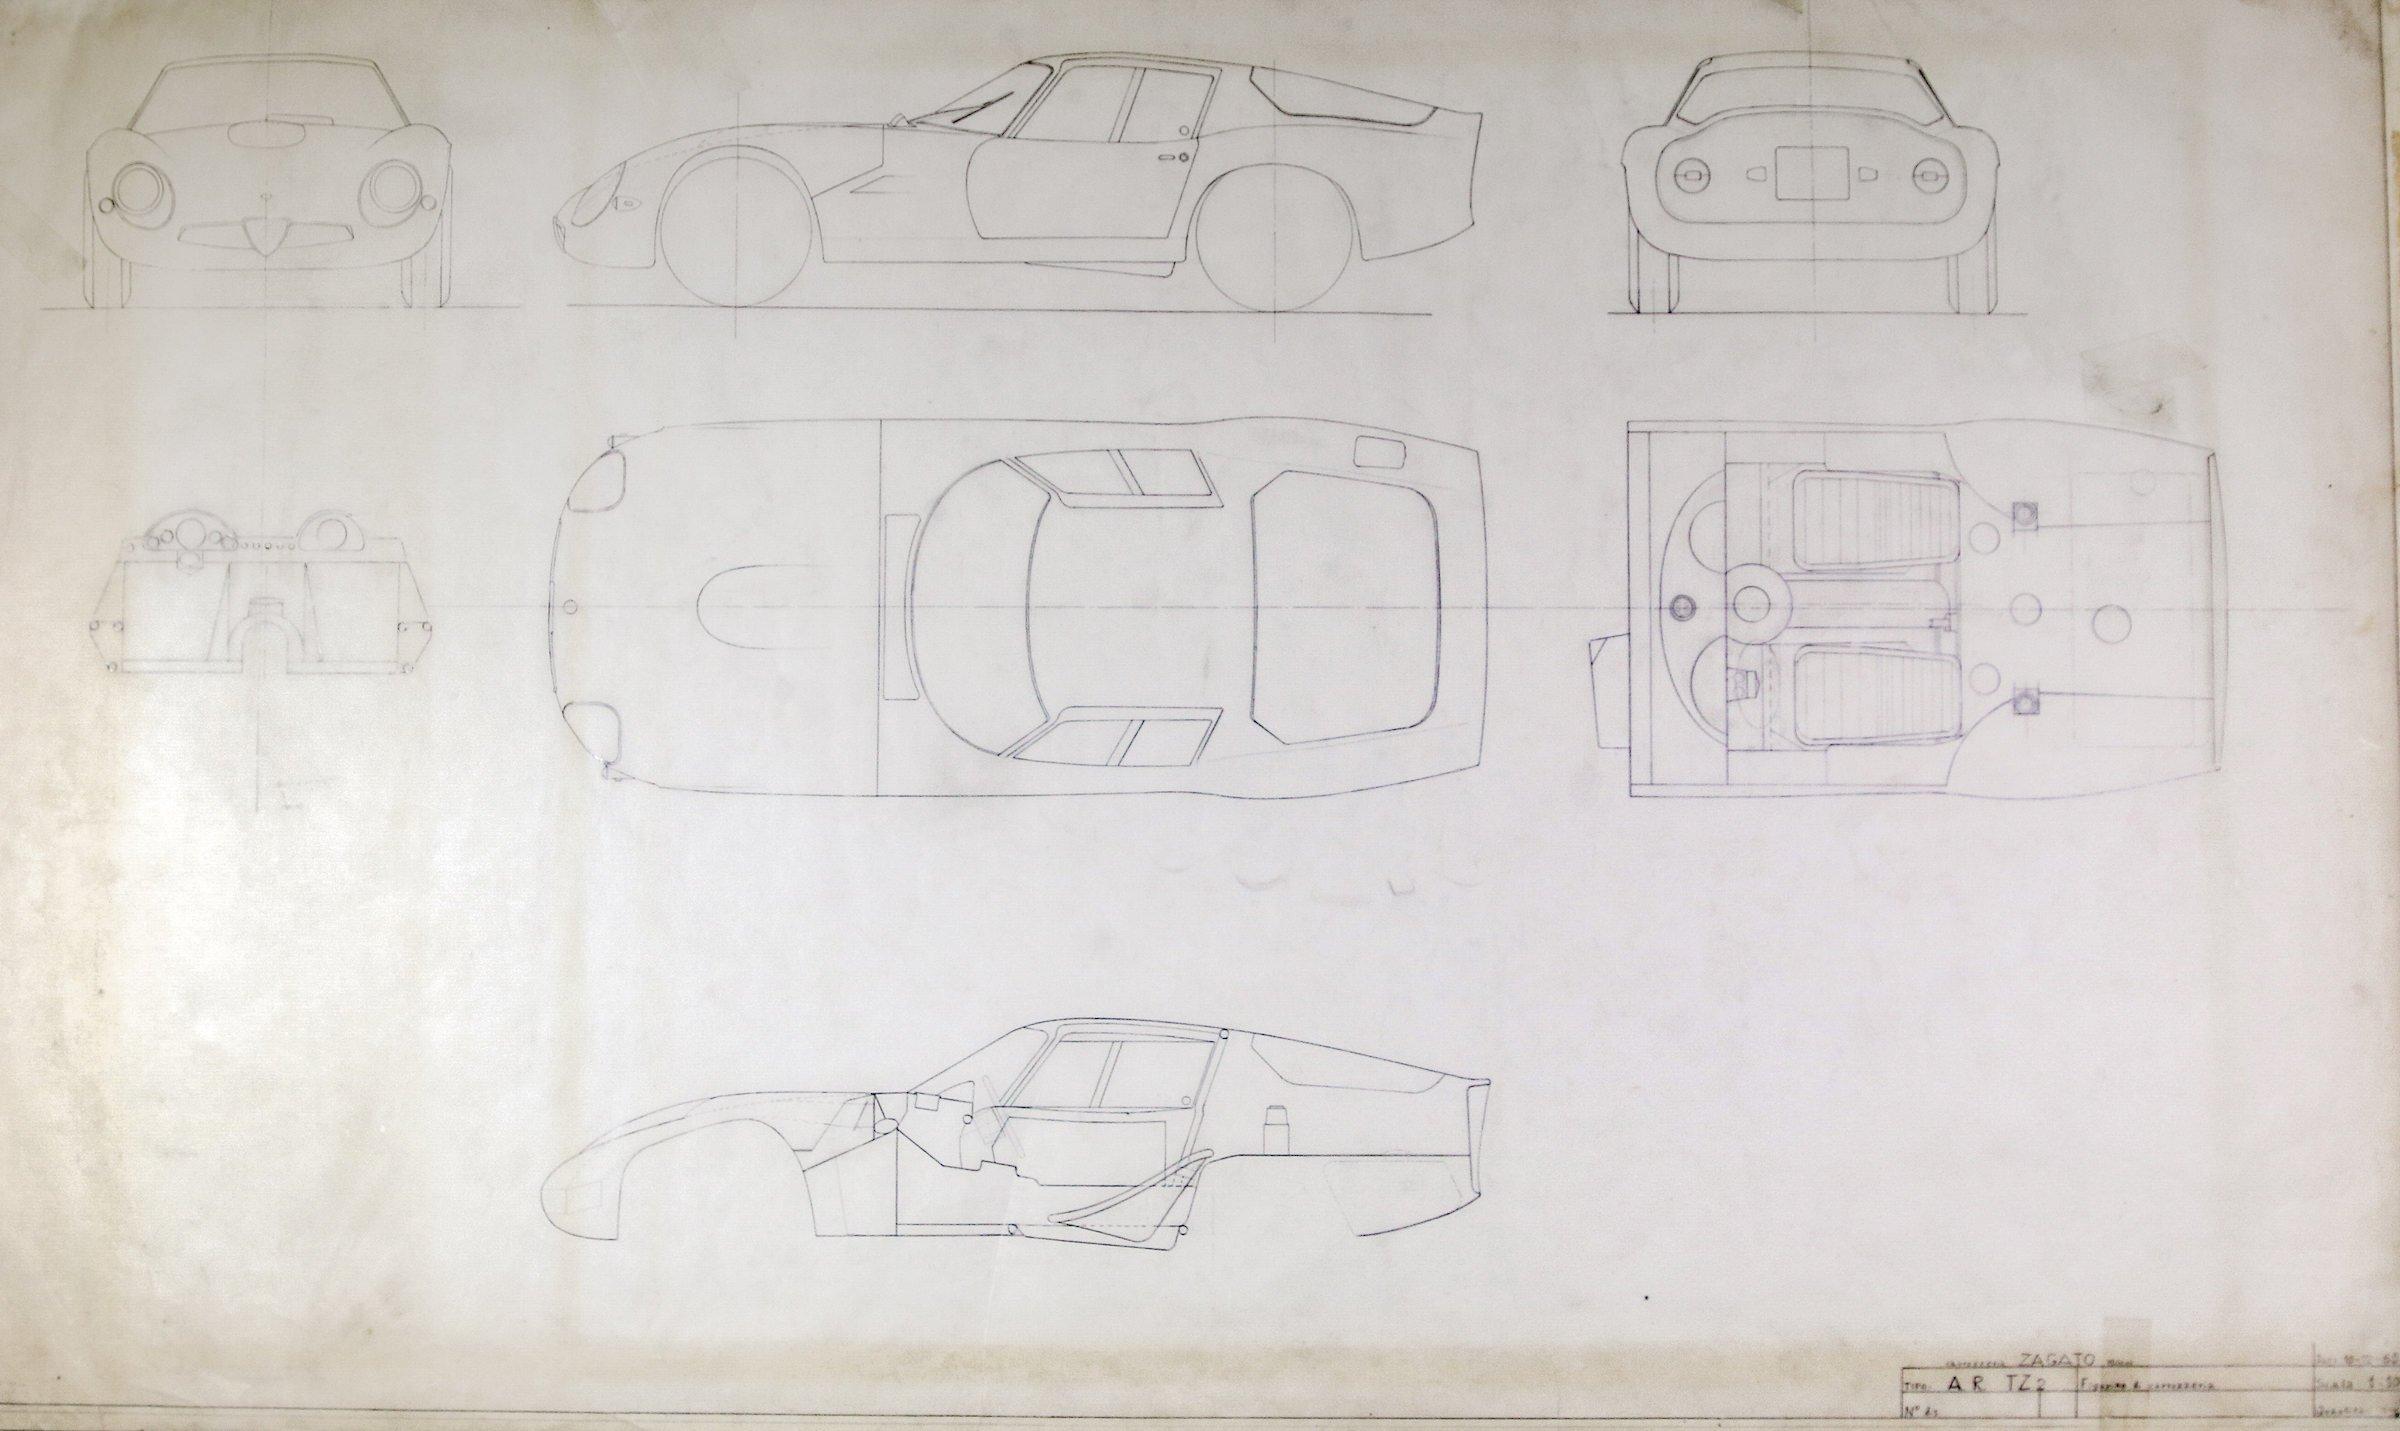 Blueprints of the Alfa Romeo Giulia Tubolare Zagato